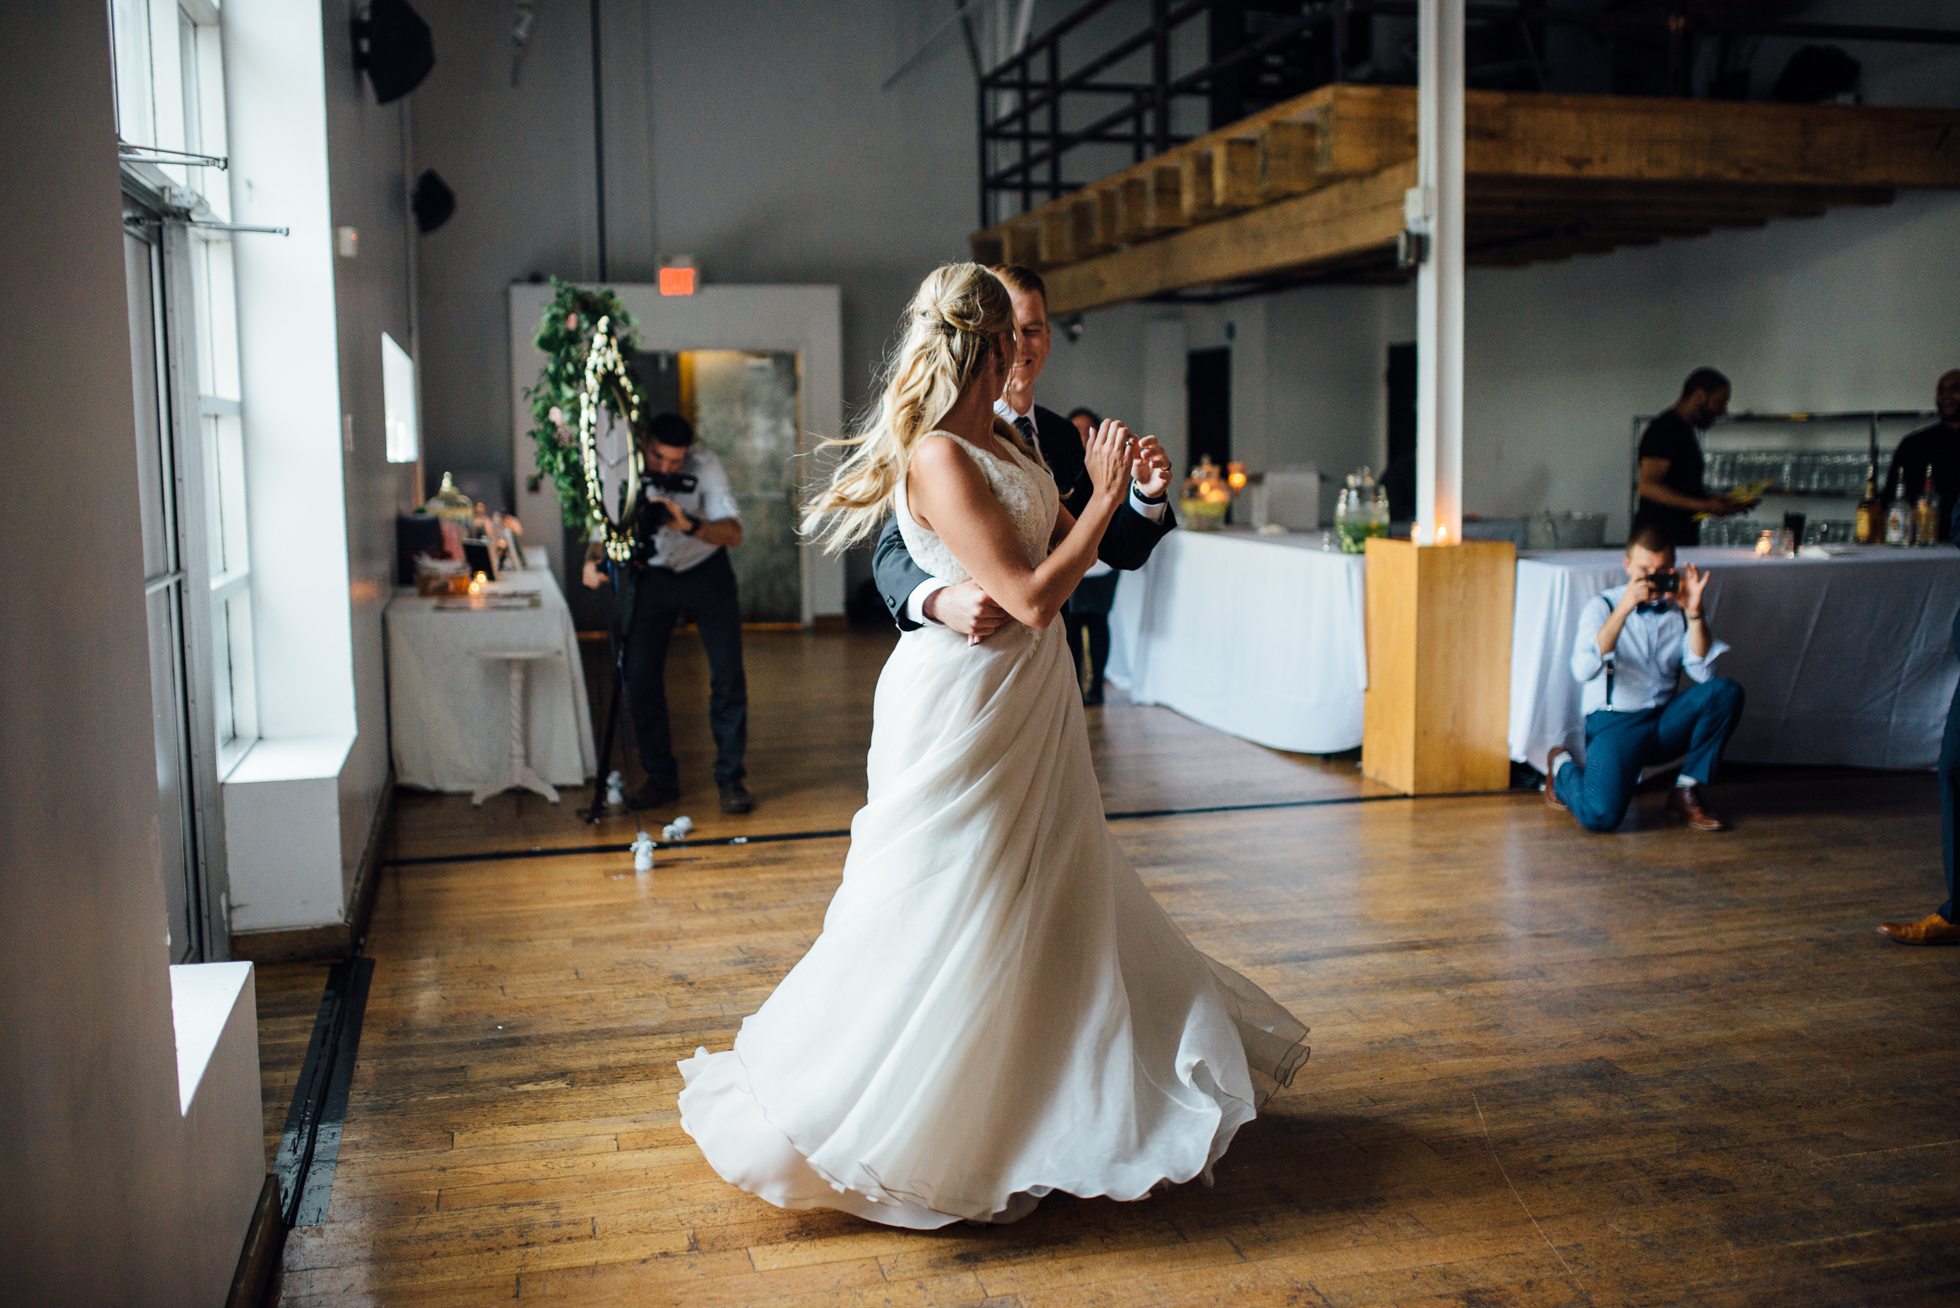 99-Sudbury-Toronto-Wedding-Photography-48.jpg